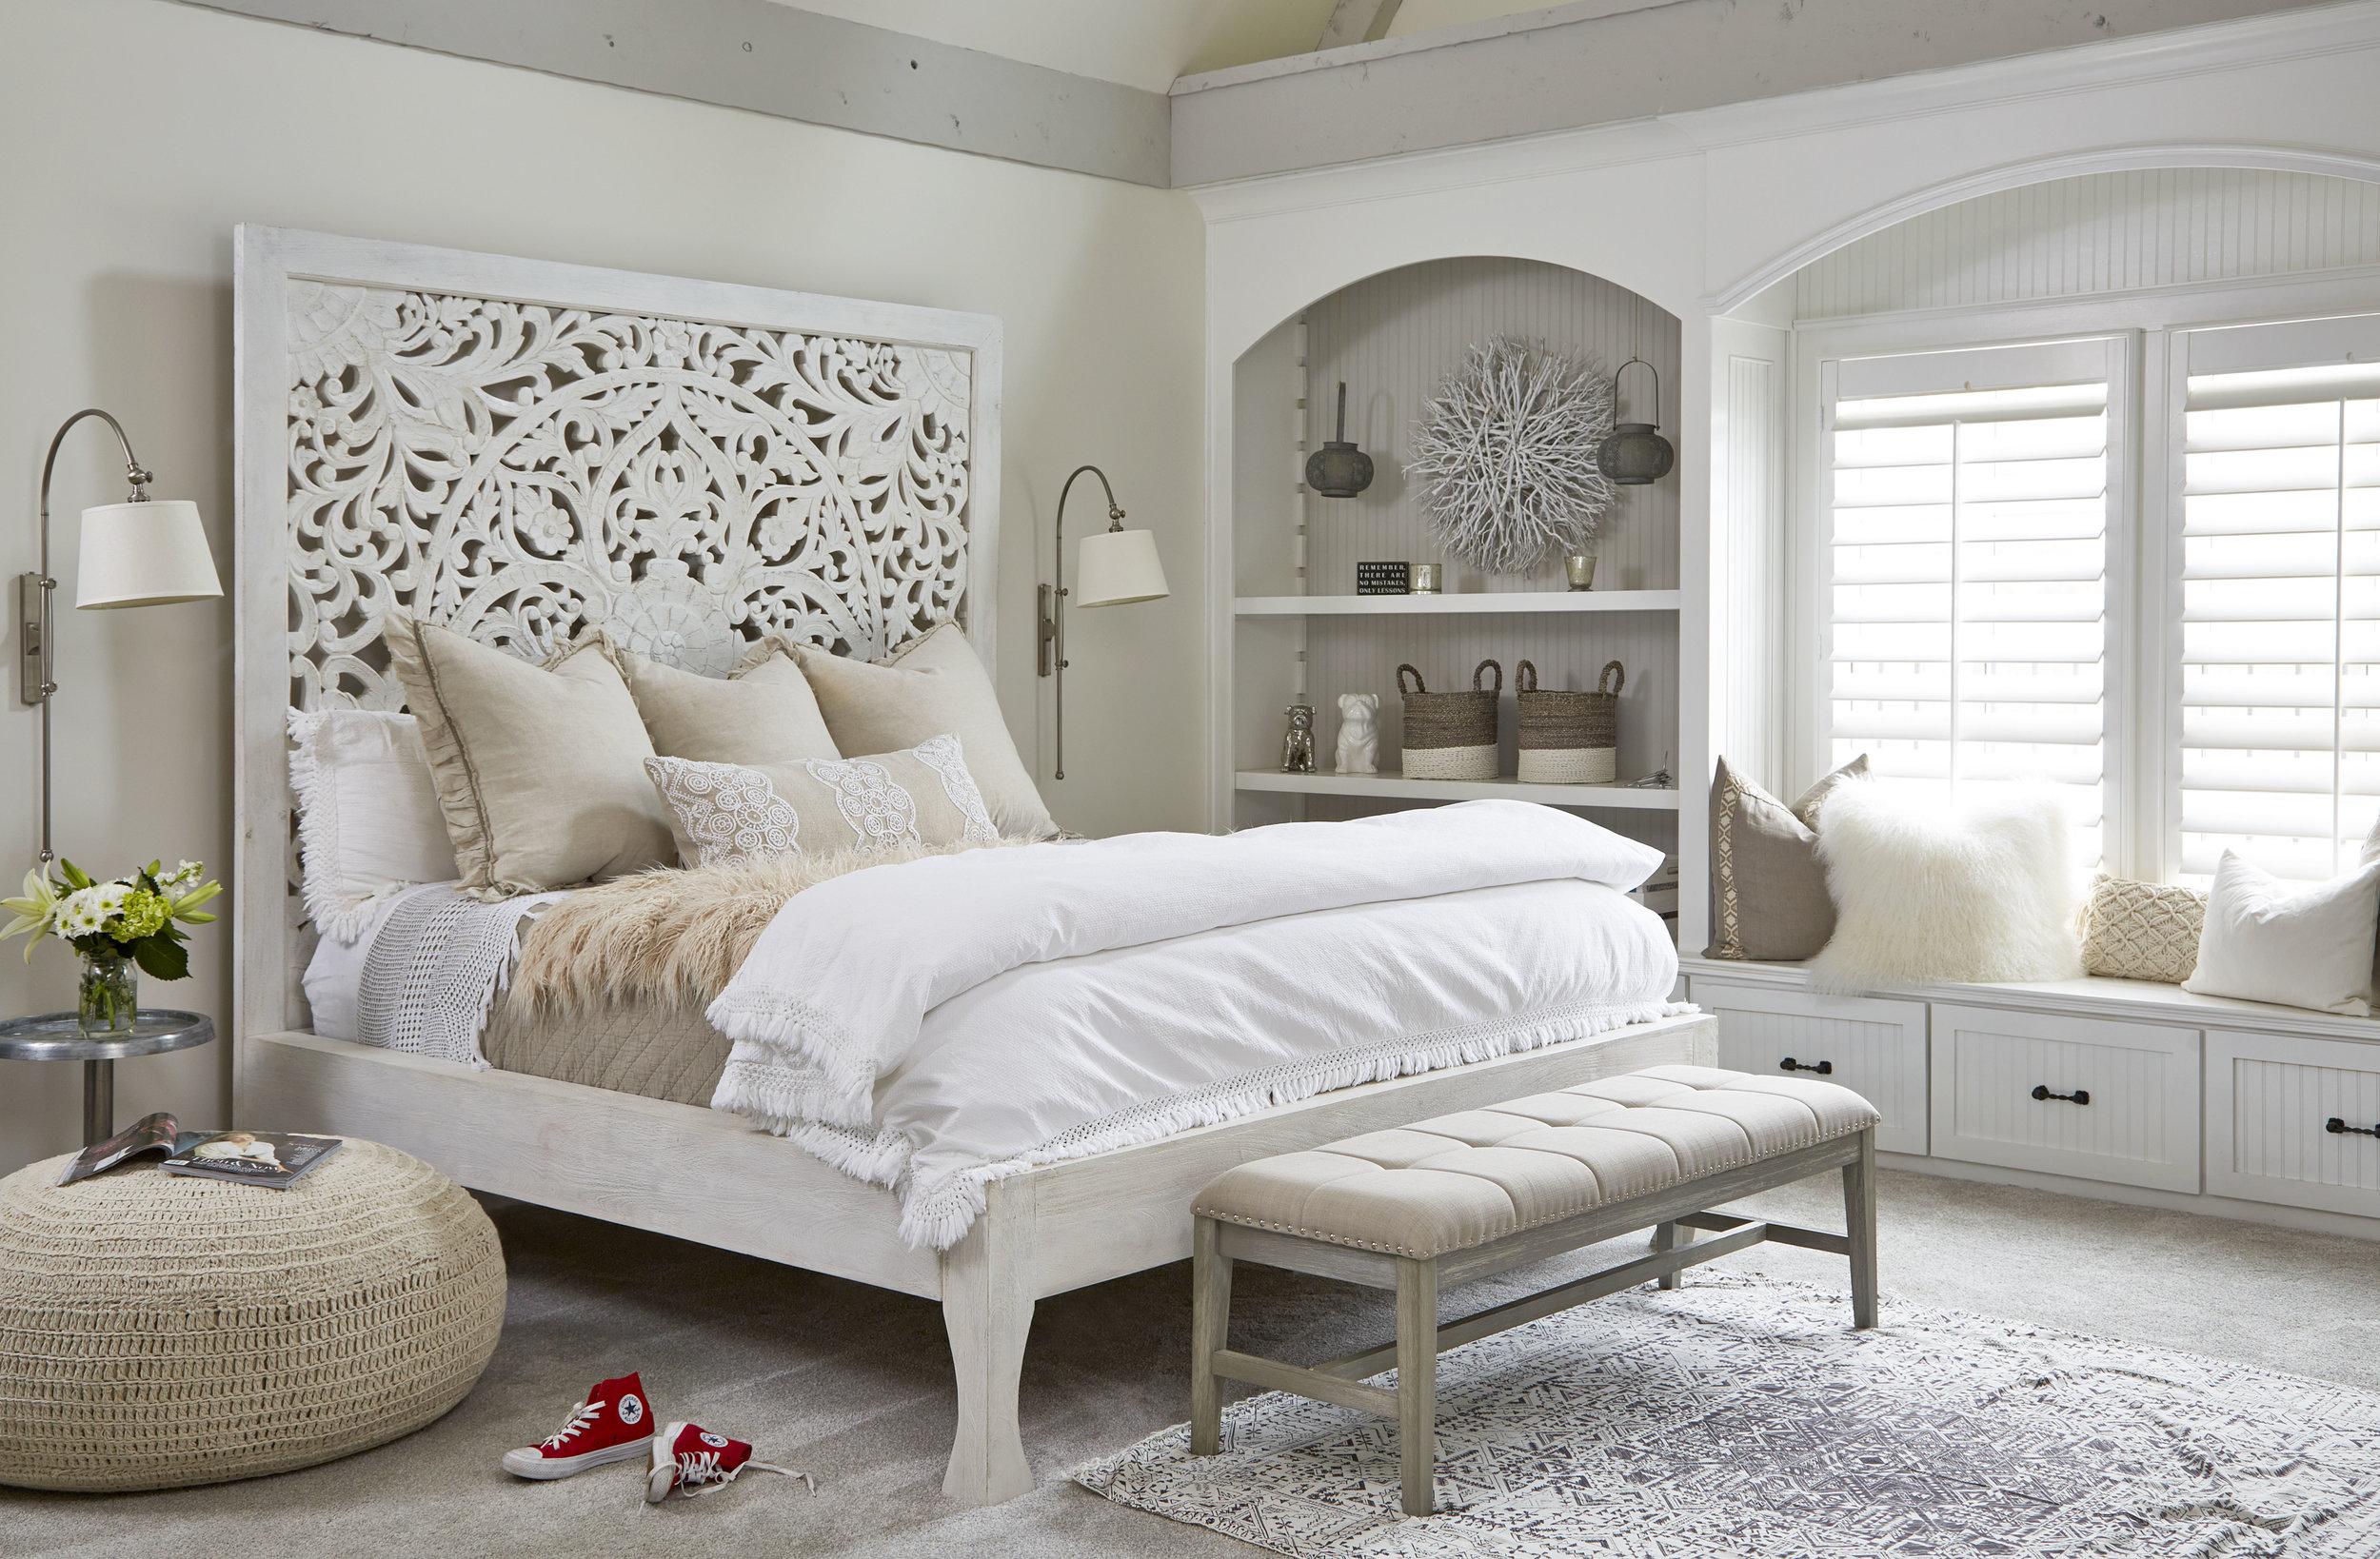 Gabrielson_Foxhollw_2_bedroom2.jpg